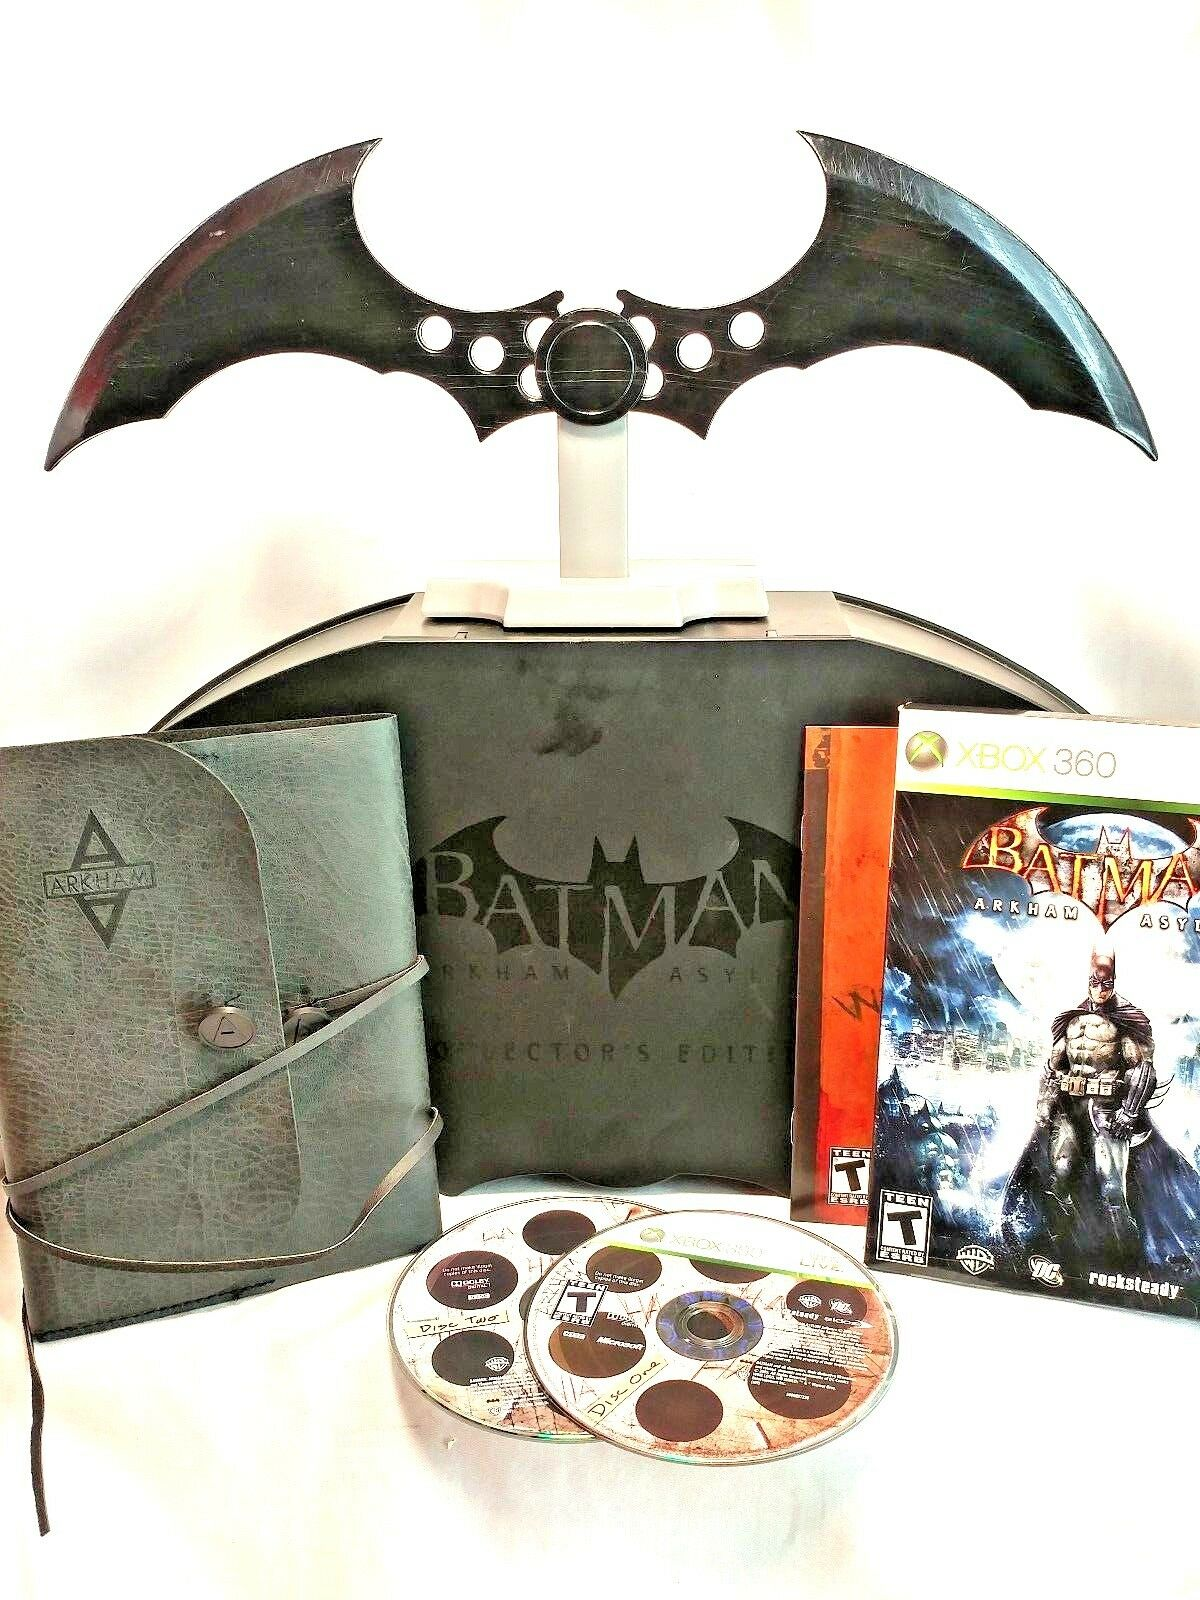 DC Universe Batman Arkham Asylum XBox 360 Game + Collectors Box w  Batarang EUC